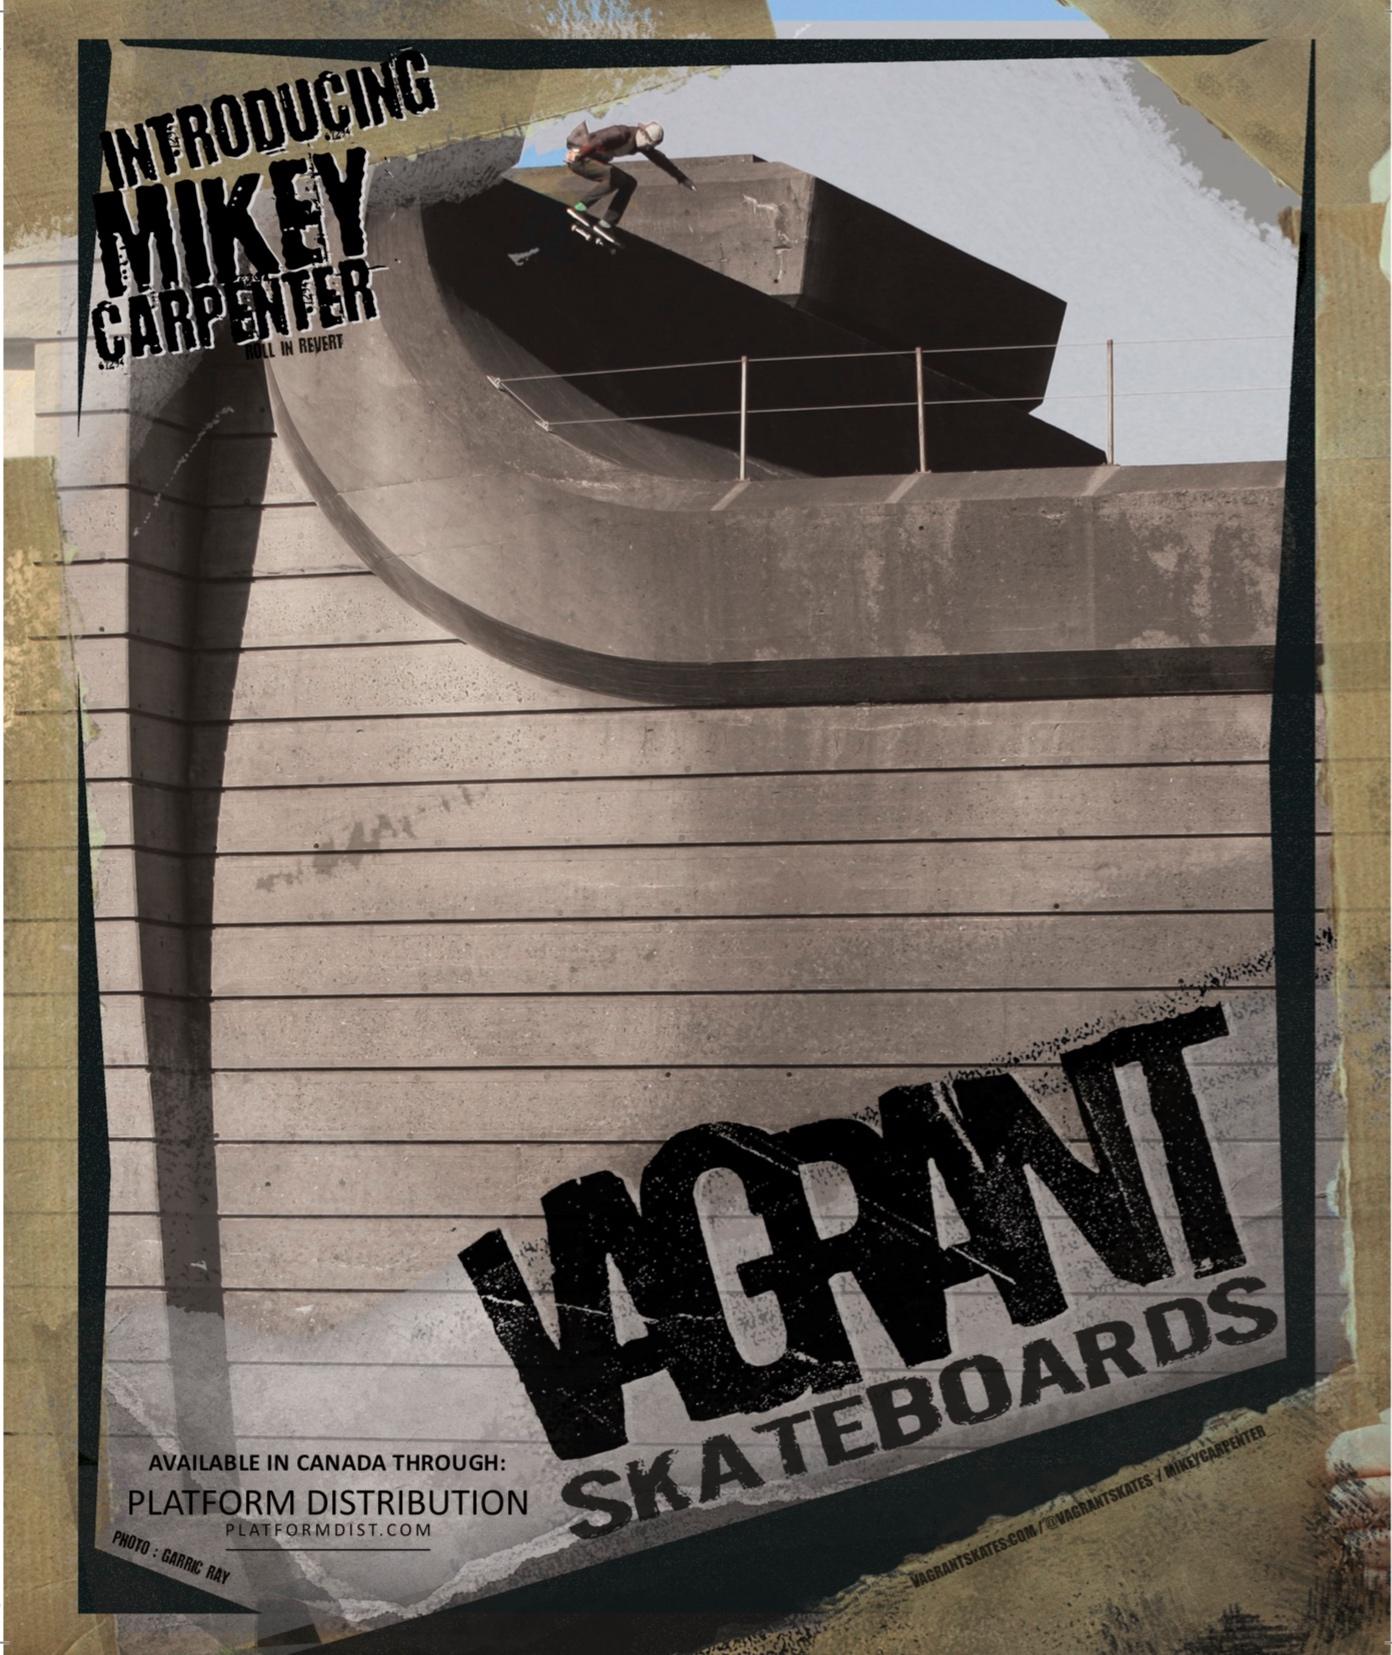 King Skate ad for Vagrant Skateboards